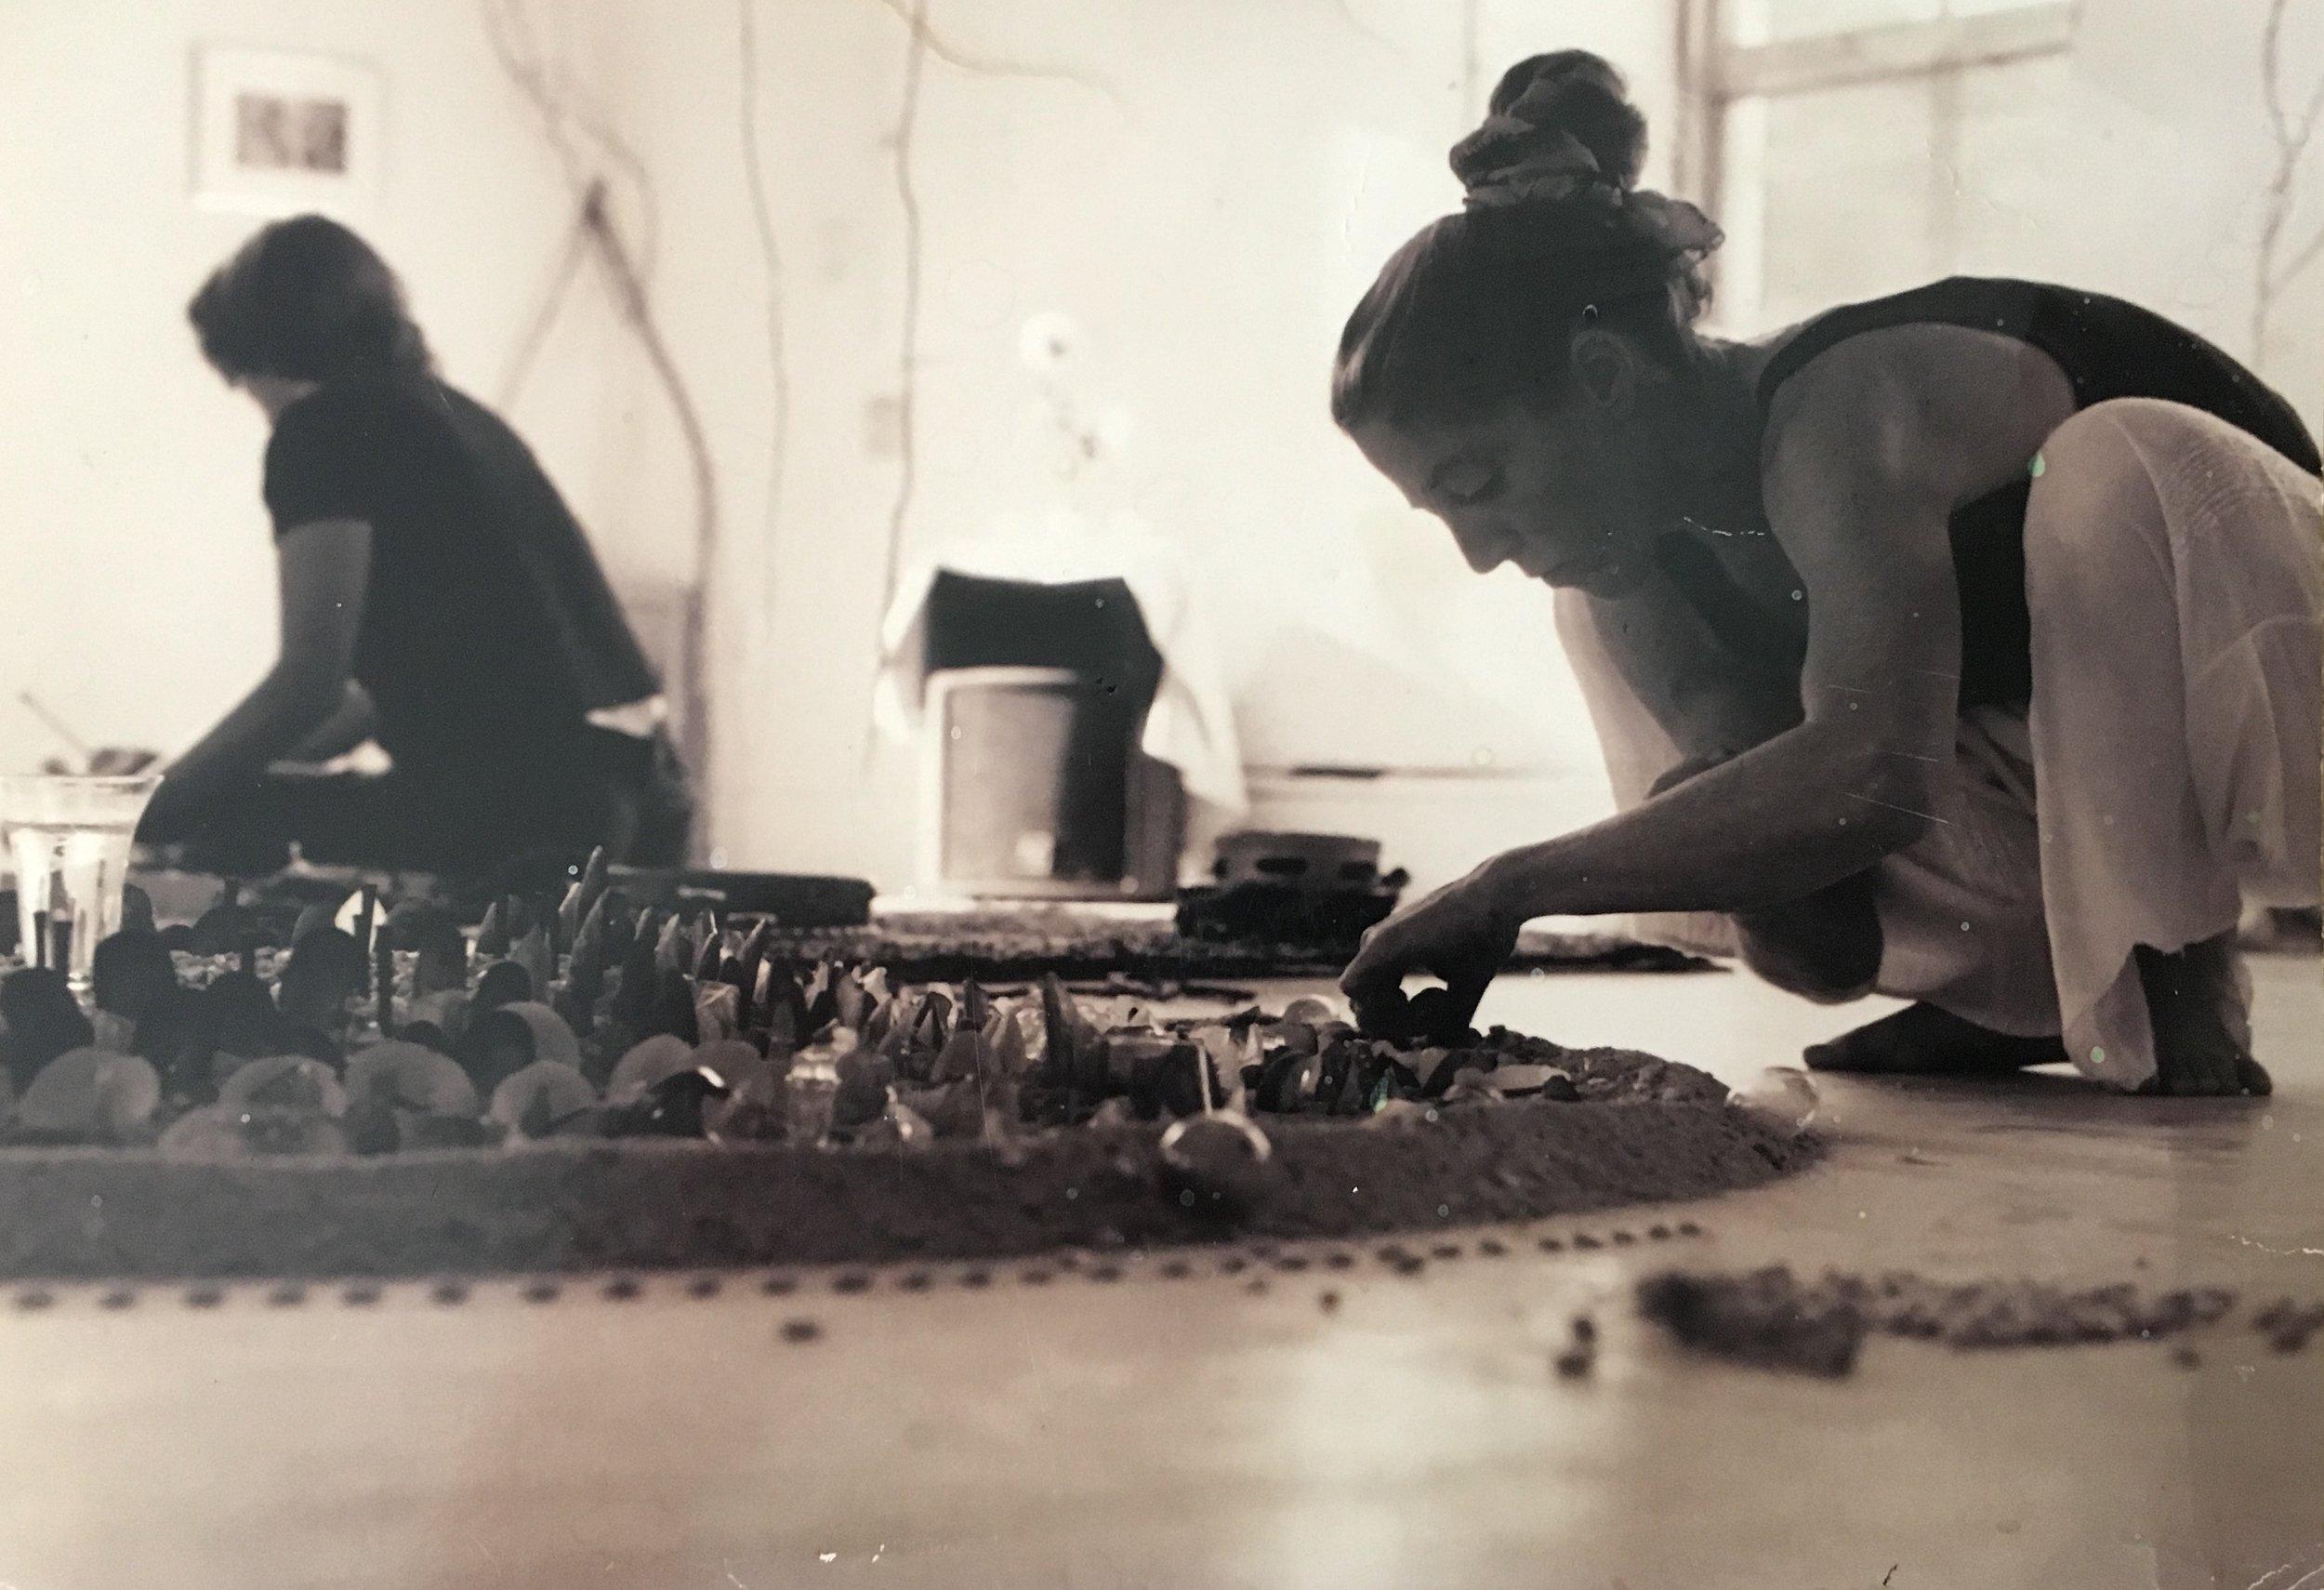 Karen Dolmanisth with Composer, Musician, Helen Harrison Photograph: Michael Billingsley Action Performance by Sculptor, Dolmanisth Sound Improvisation, Helen Harrison